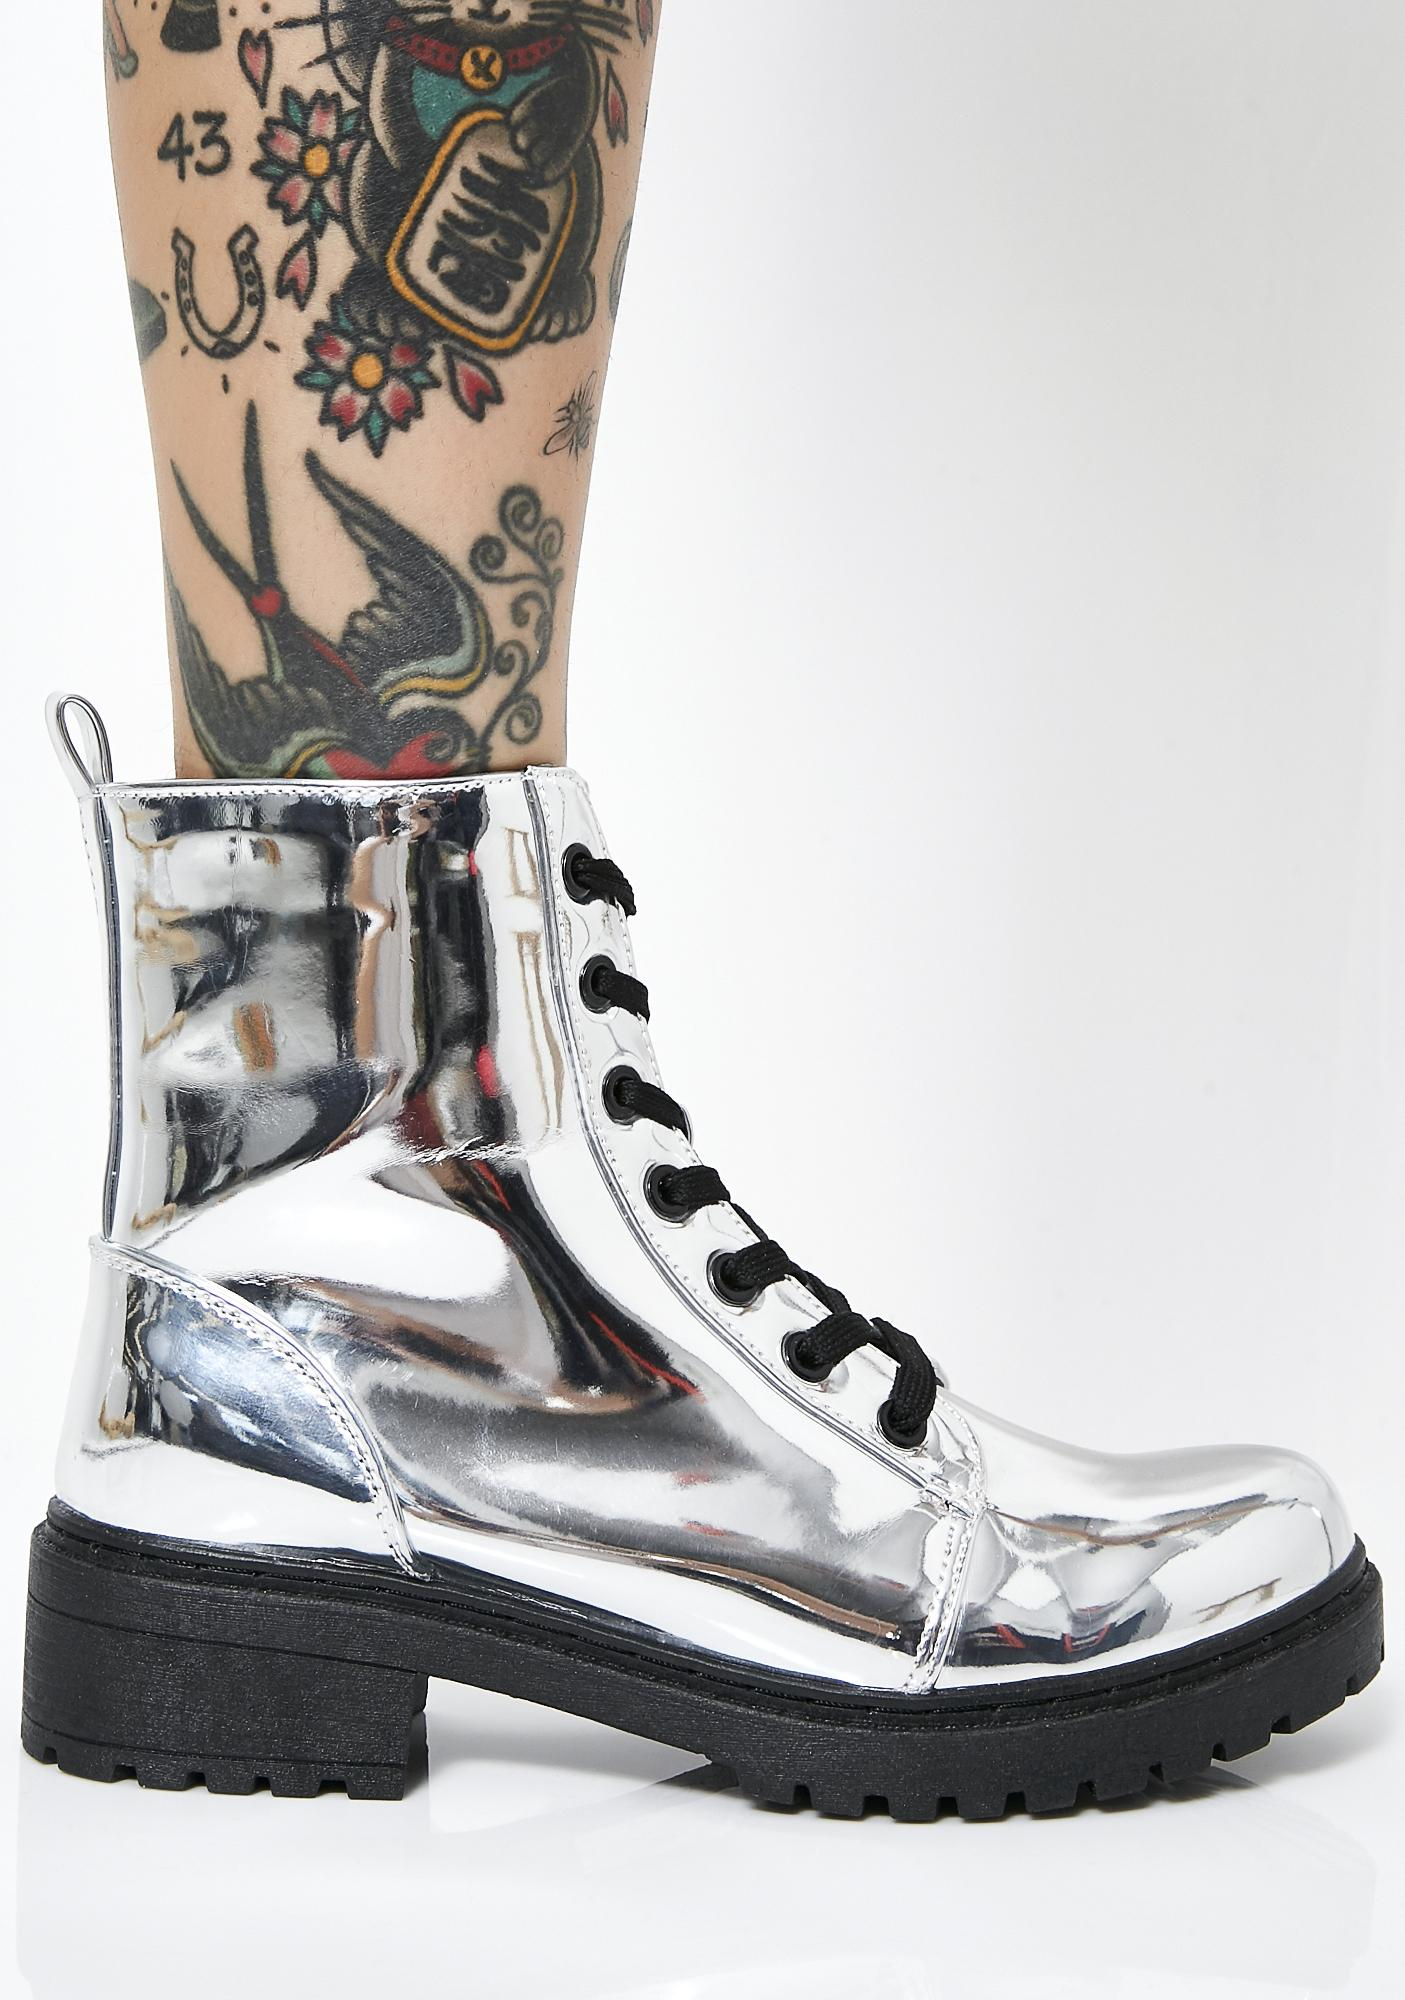 Lunar Landings Combat Boots